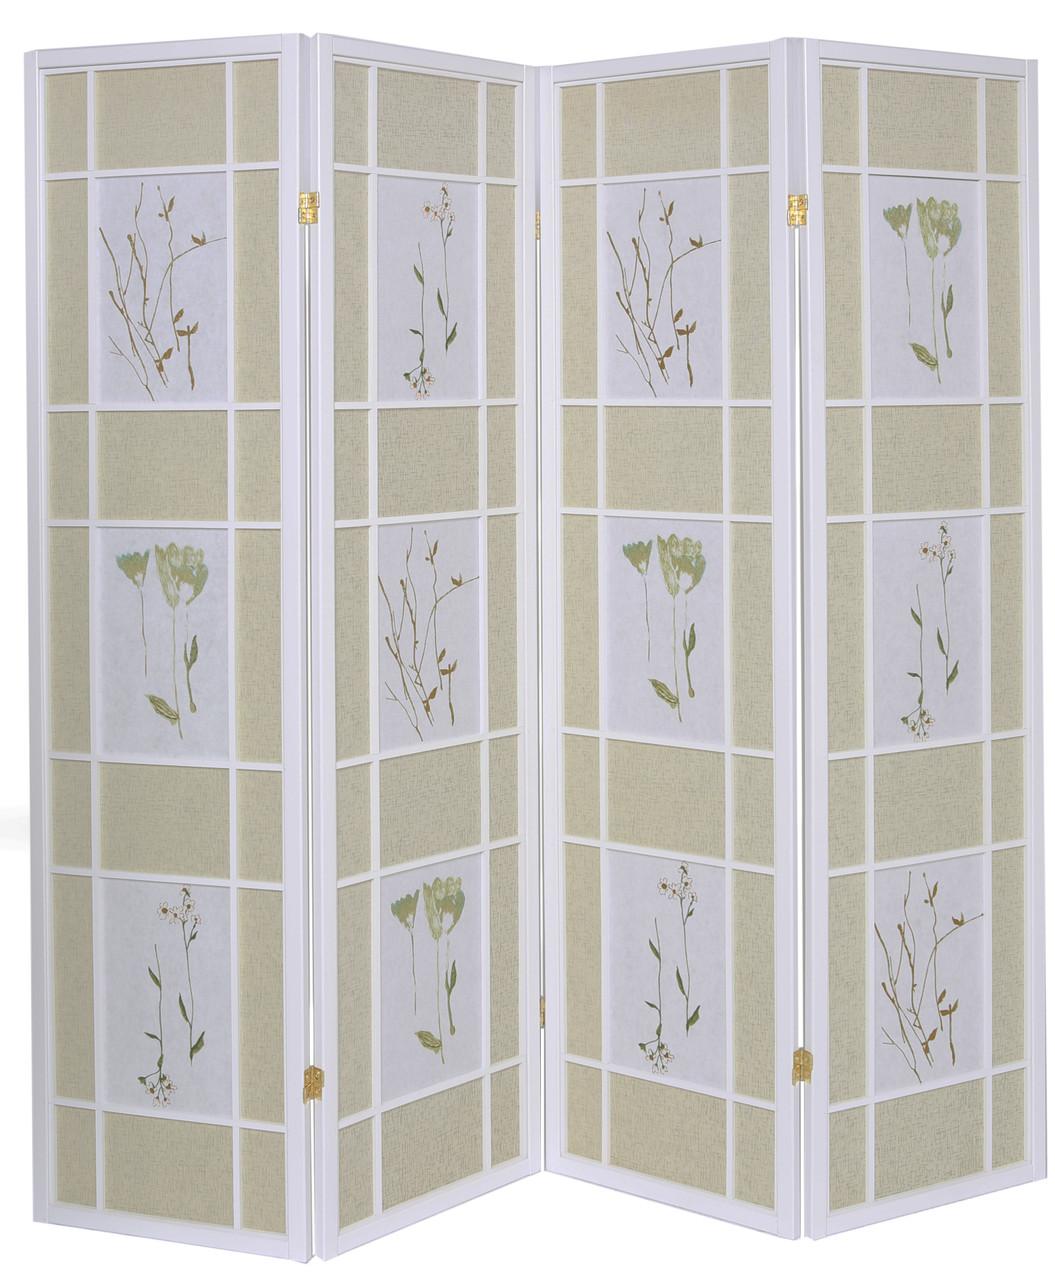 Room Divider 4 Panel Floral Accented White Wood Frame Printed Shoji Paper in USA, California, New York, New York City, Los Angeles, San Francisco, Pennsylvania, Washington DC, Virginia, Maryland